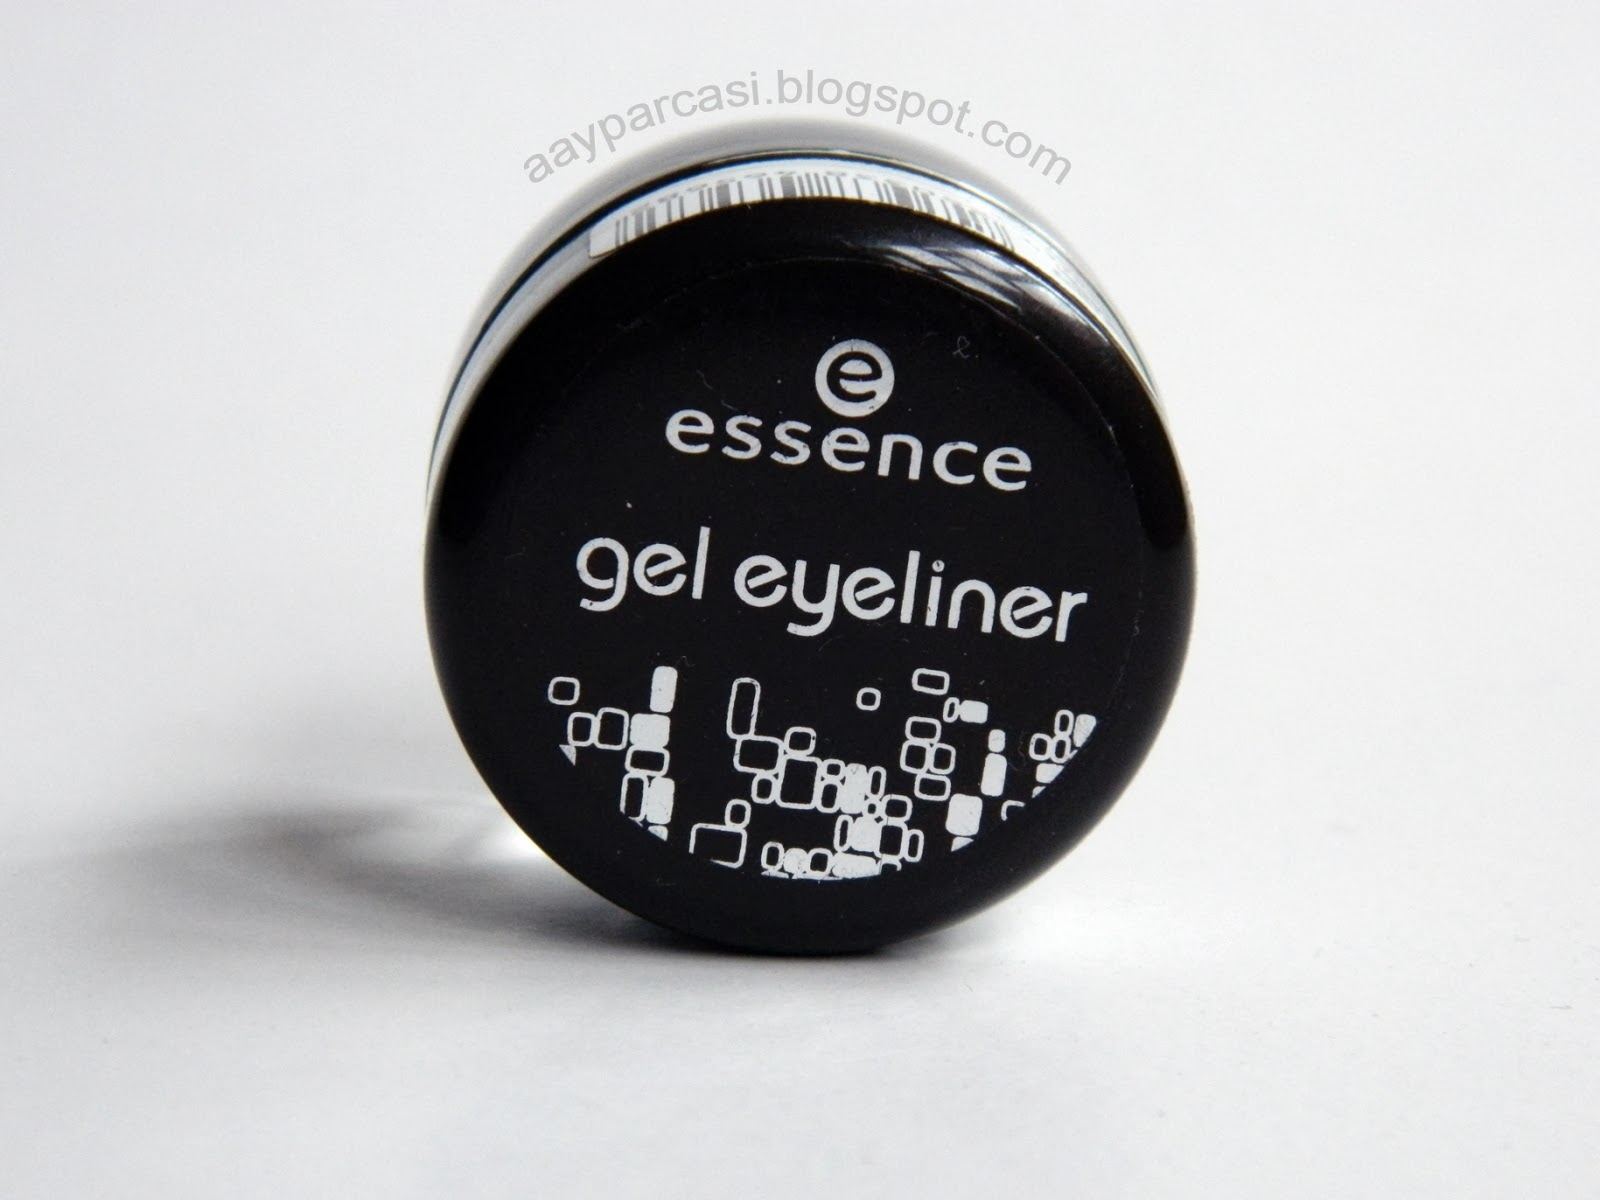 essence jel eyeliner